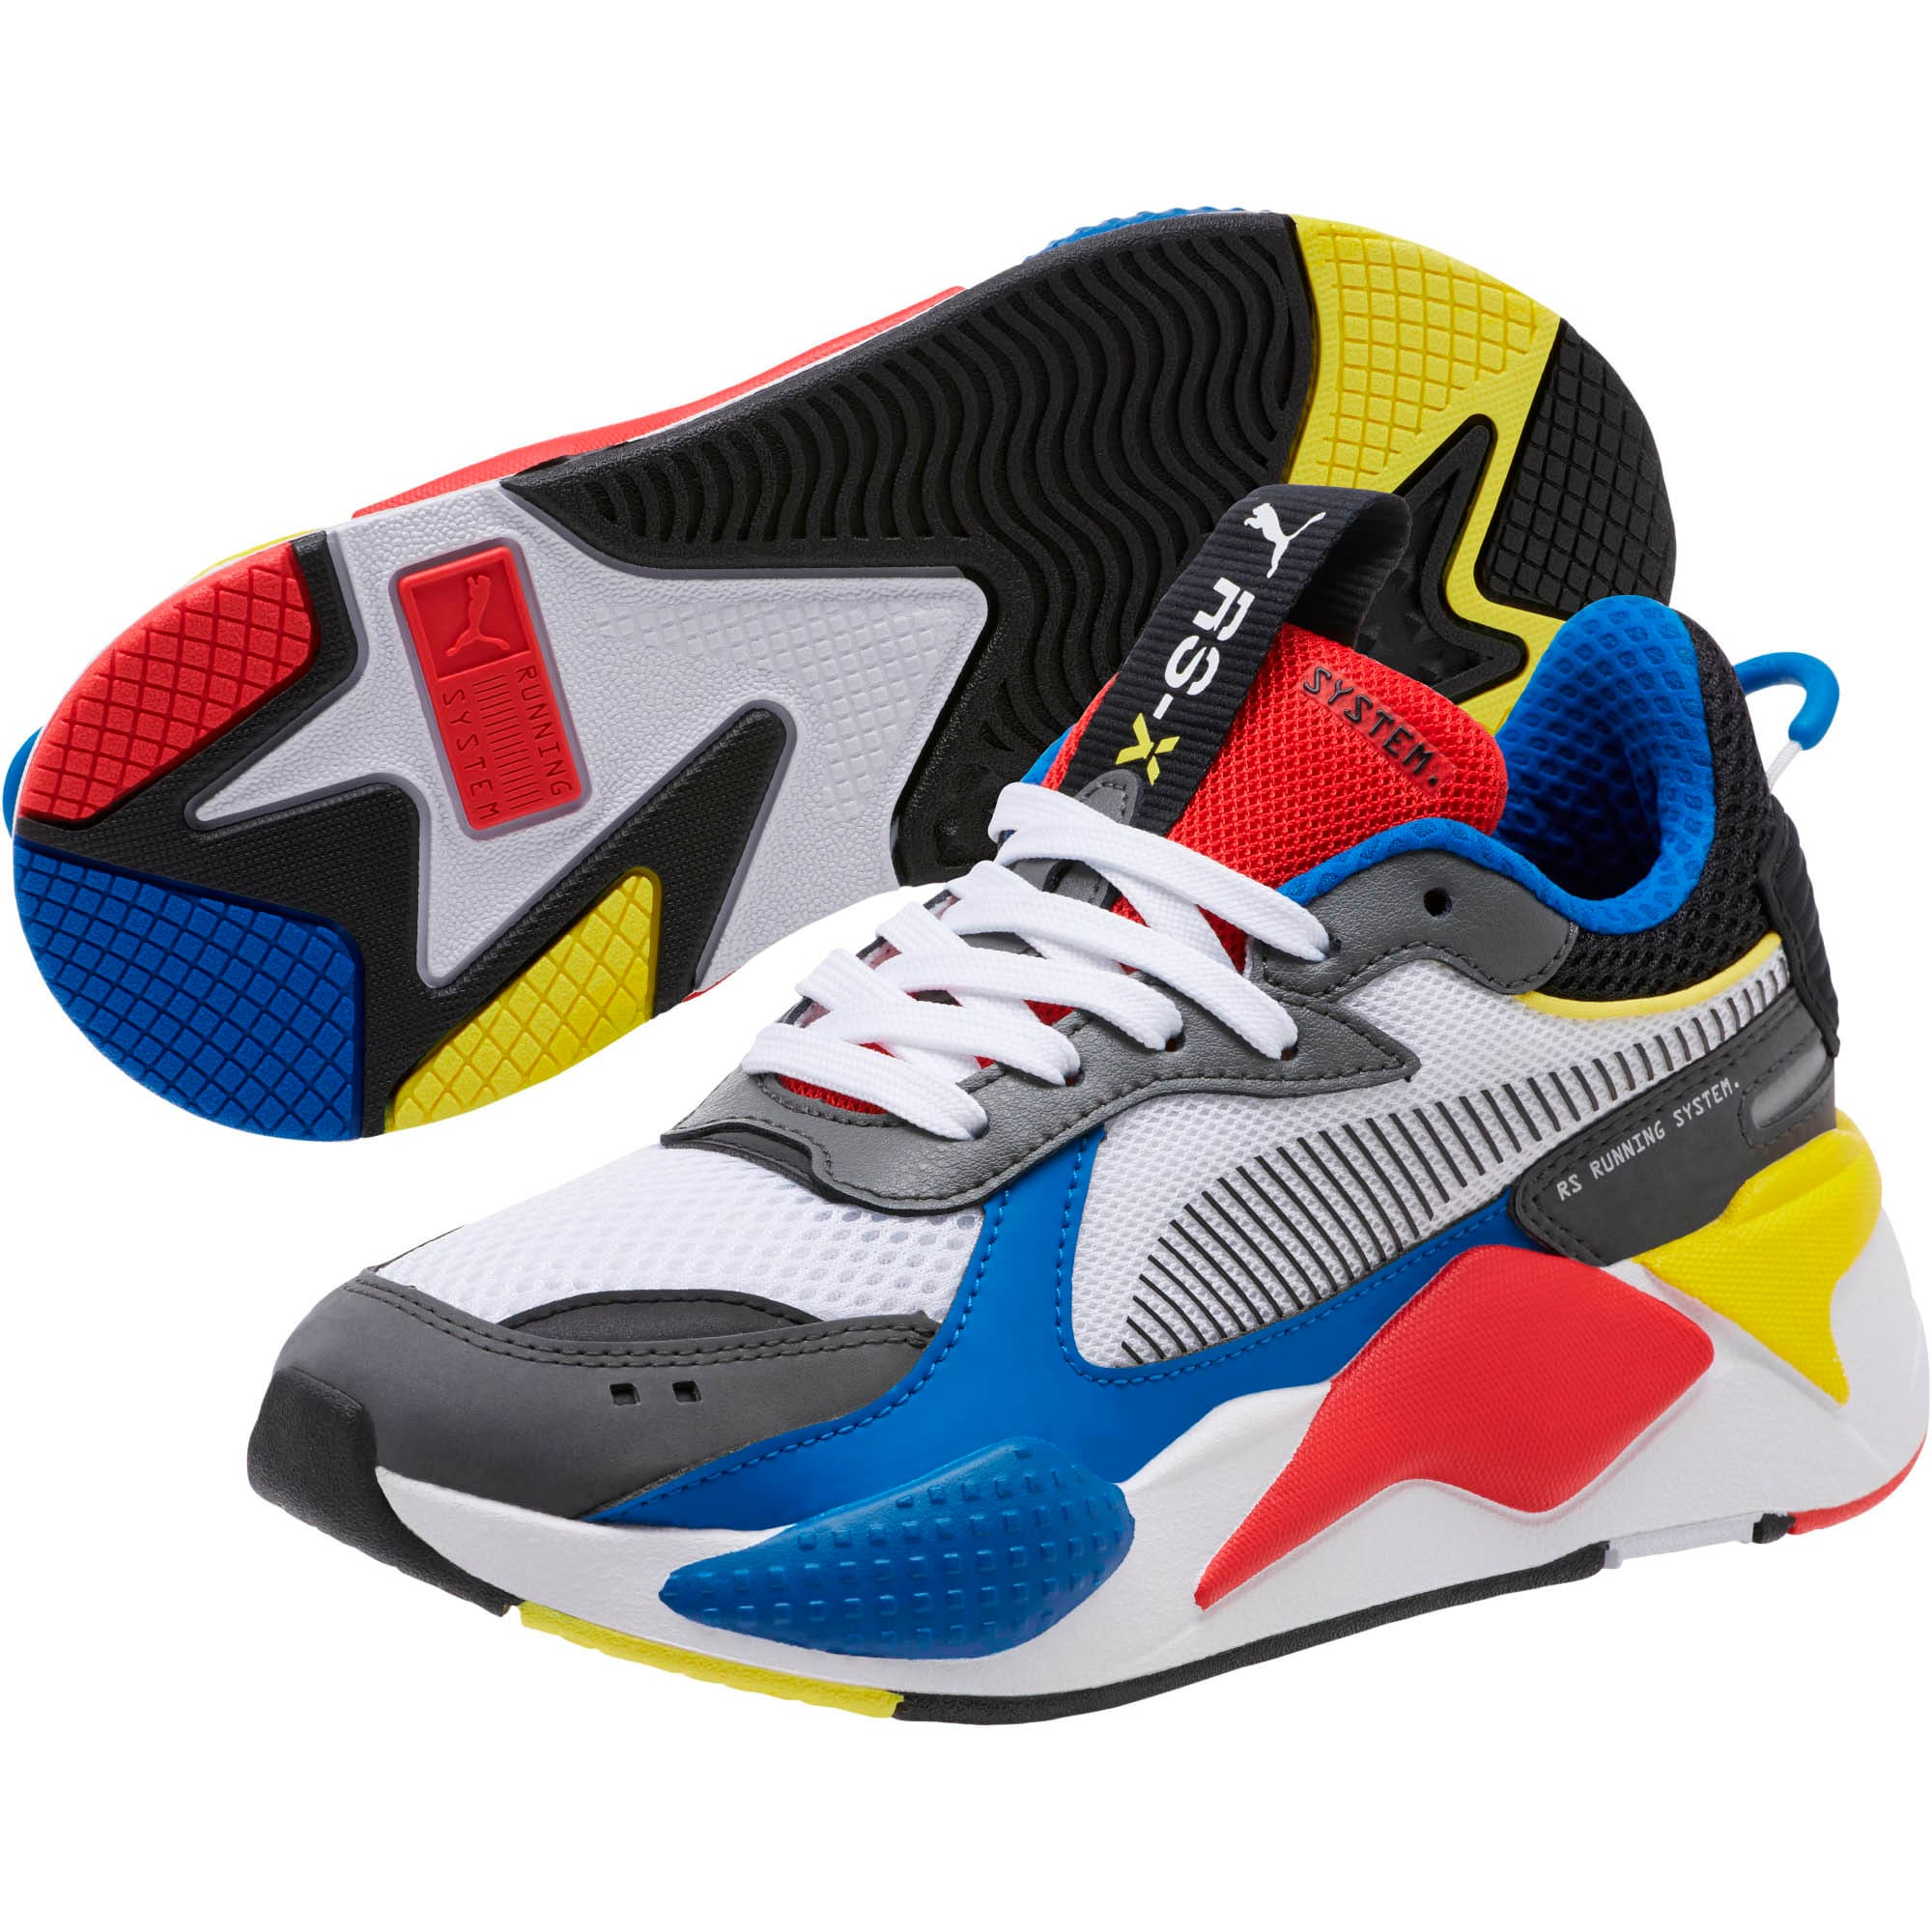 Thumbnail 2 of RS-X Toys Sneakers JR, Puma White-Puma Royal, medium